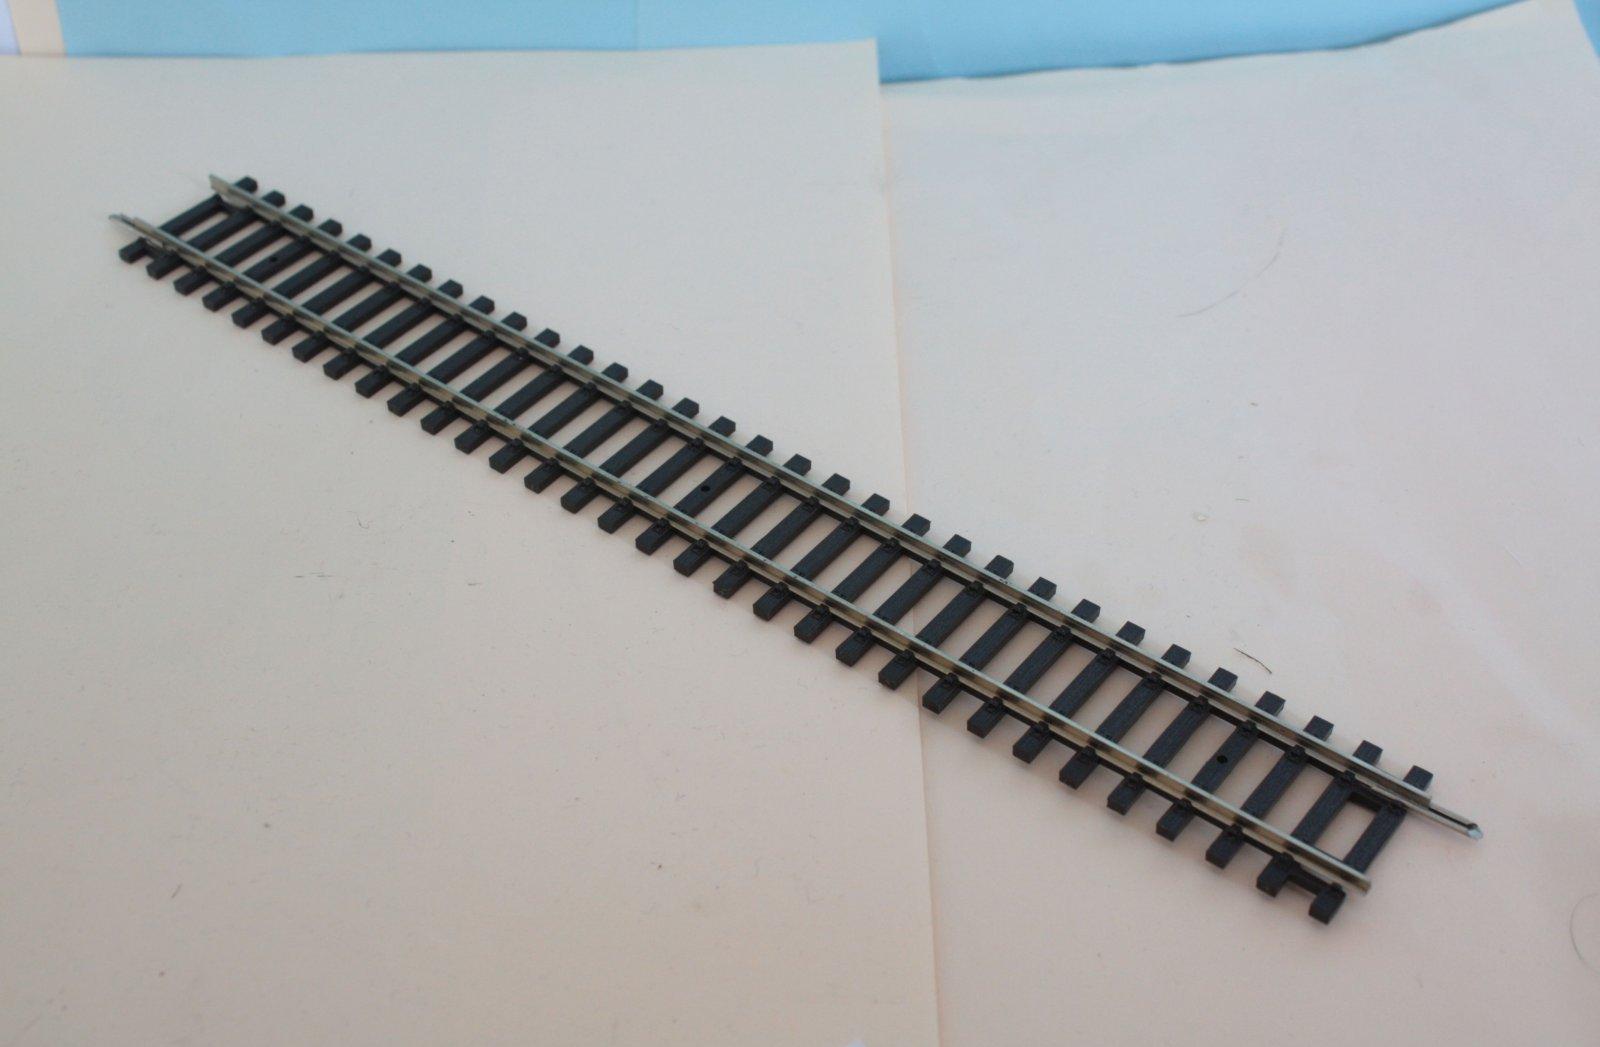 Piko 55201  A-Gleis - Gerade G231 - neu - 231mm - aus Startset